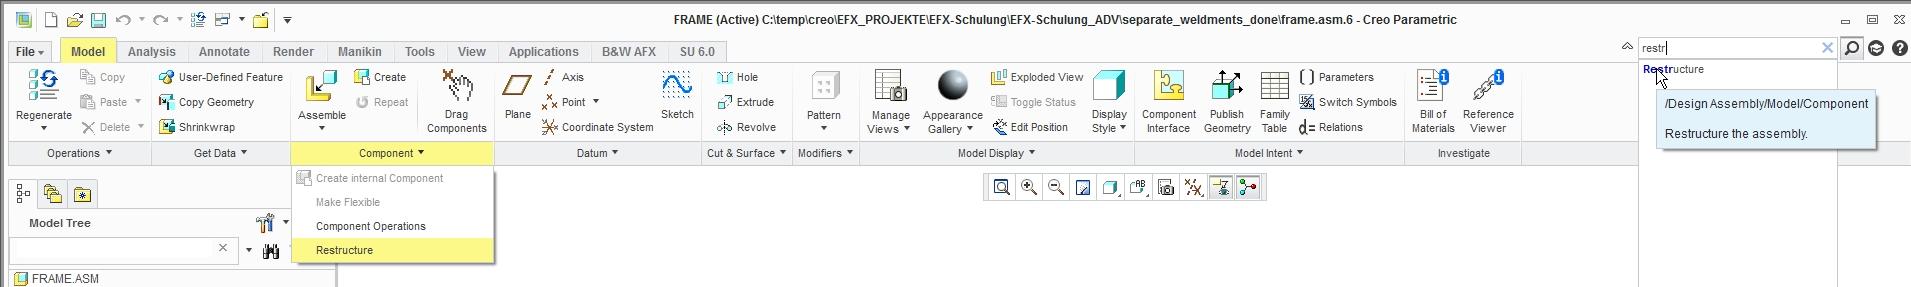 ScreenShot 851 FRAME (Active) C__temp_creo_EFX_PROJEKTE_EFX-Schulung_EFX-Schulung_ADV_separate_weldments_done_frame.asm.6 - Creo Parametric.jpg